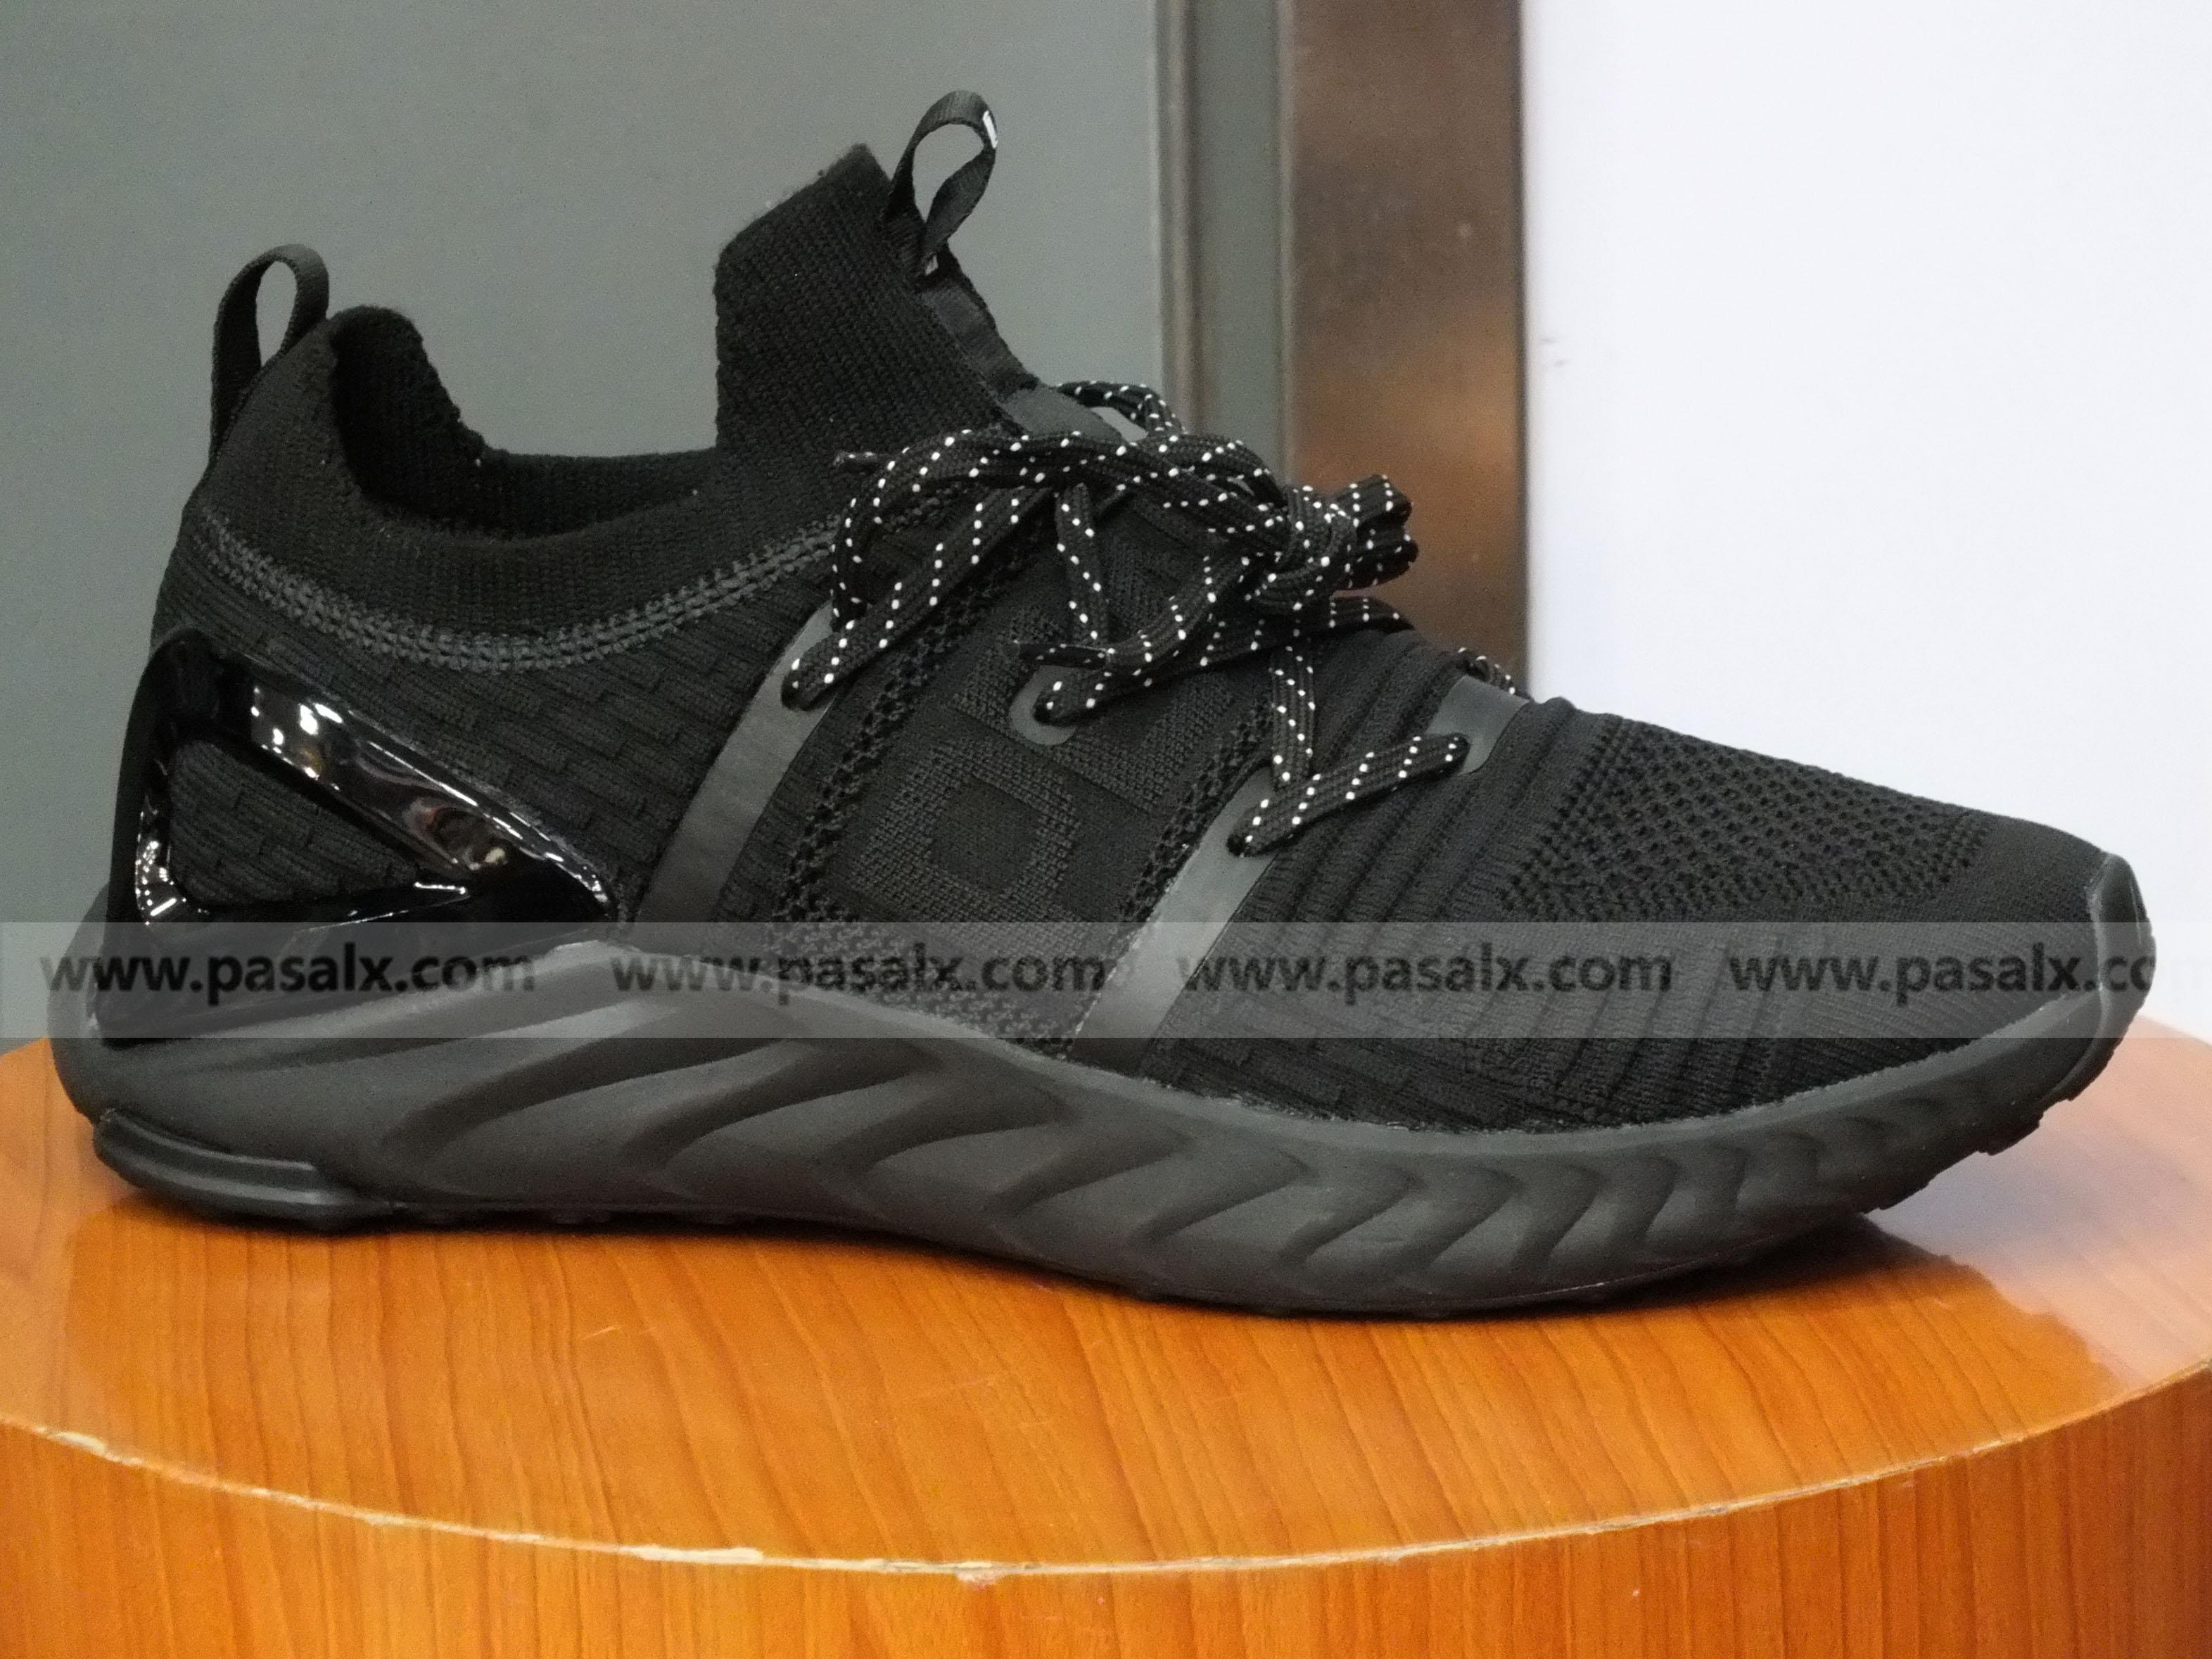 PEAK Taichi Cushion Running Shoes For Men